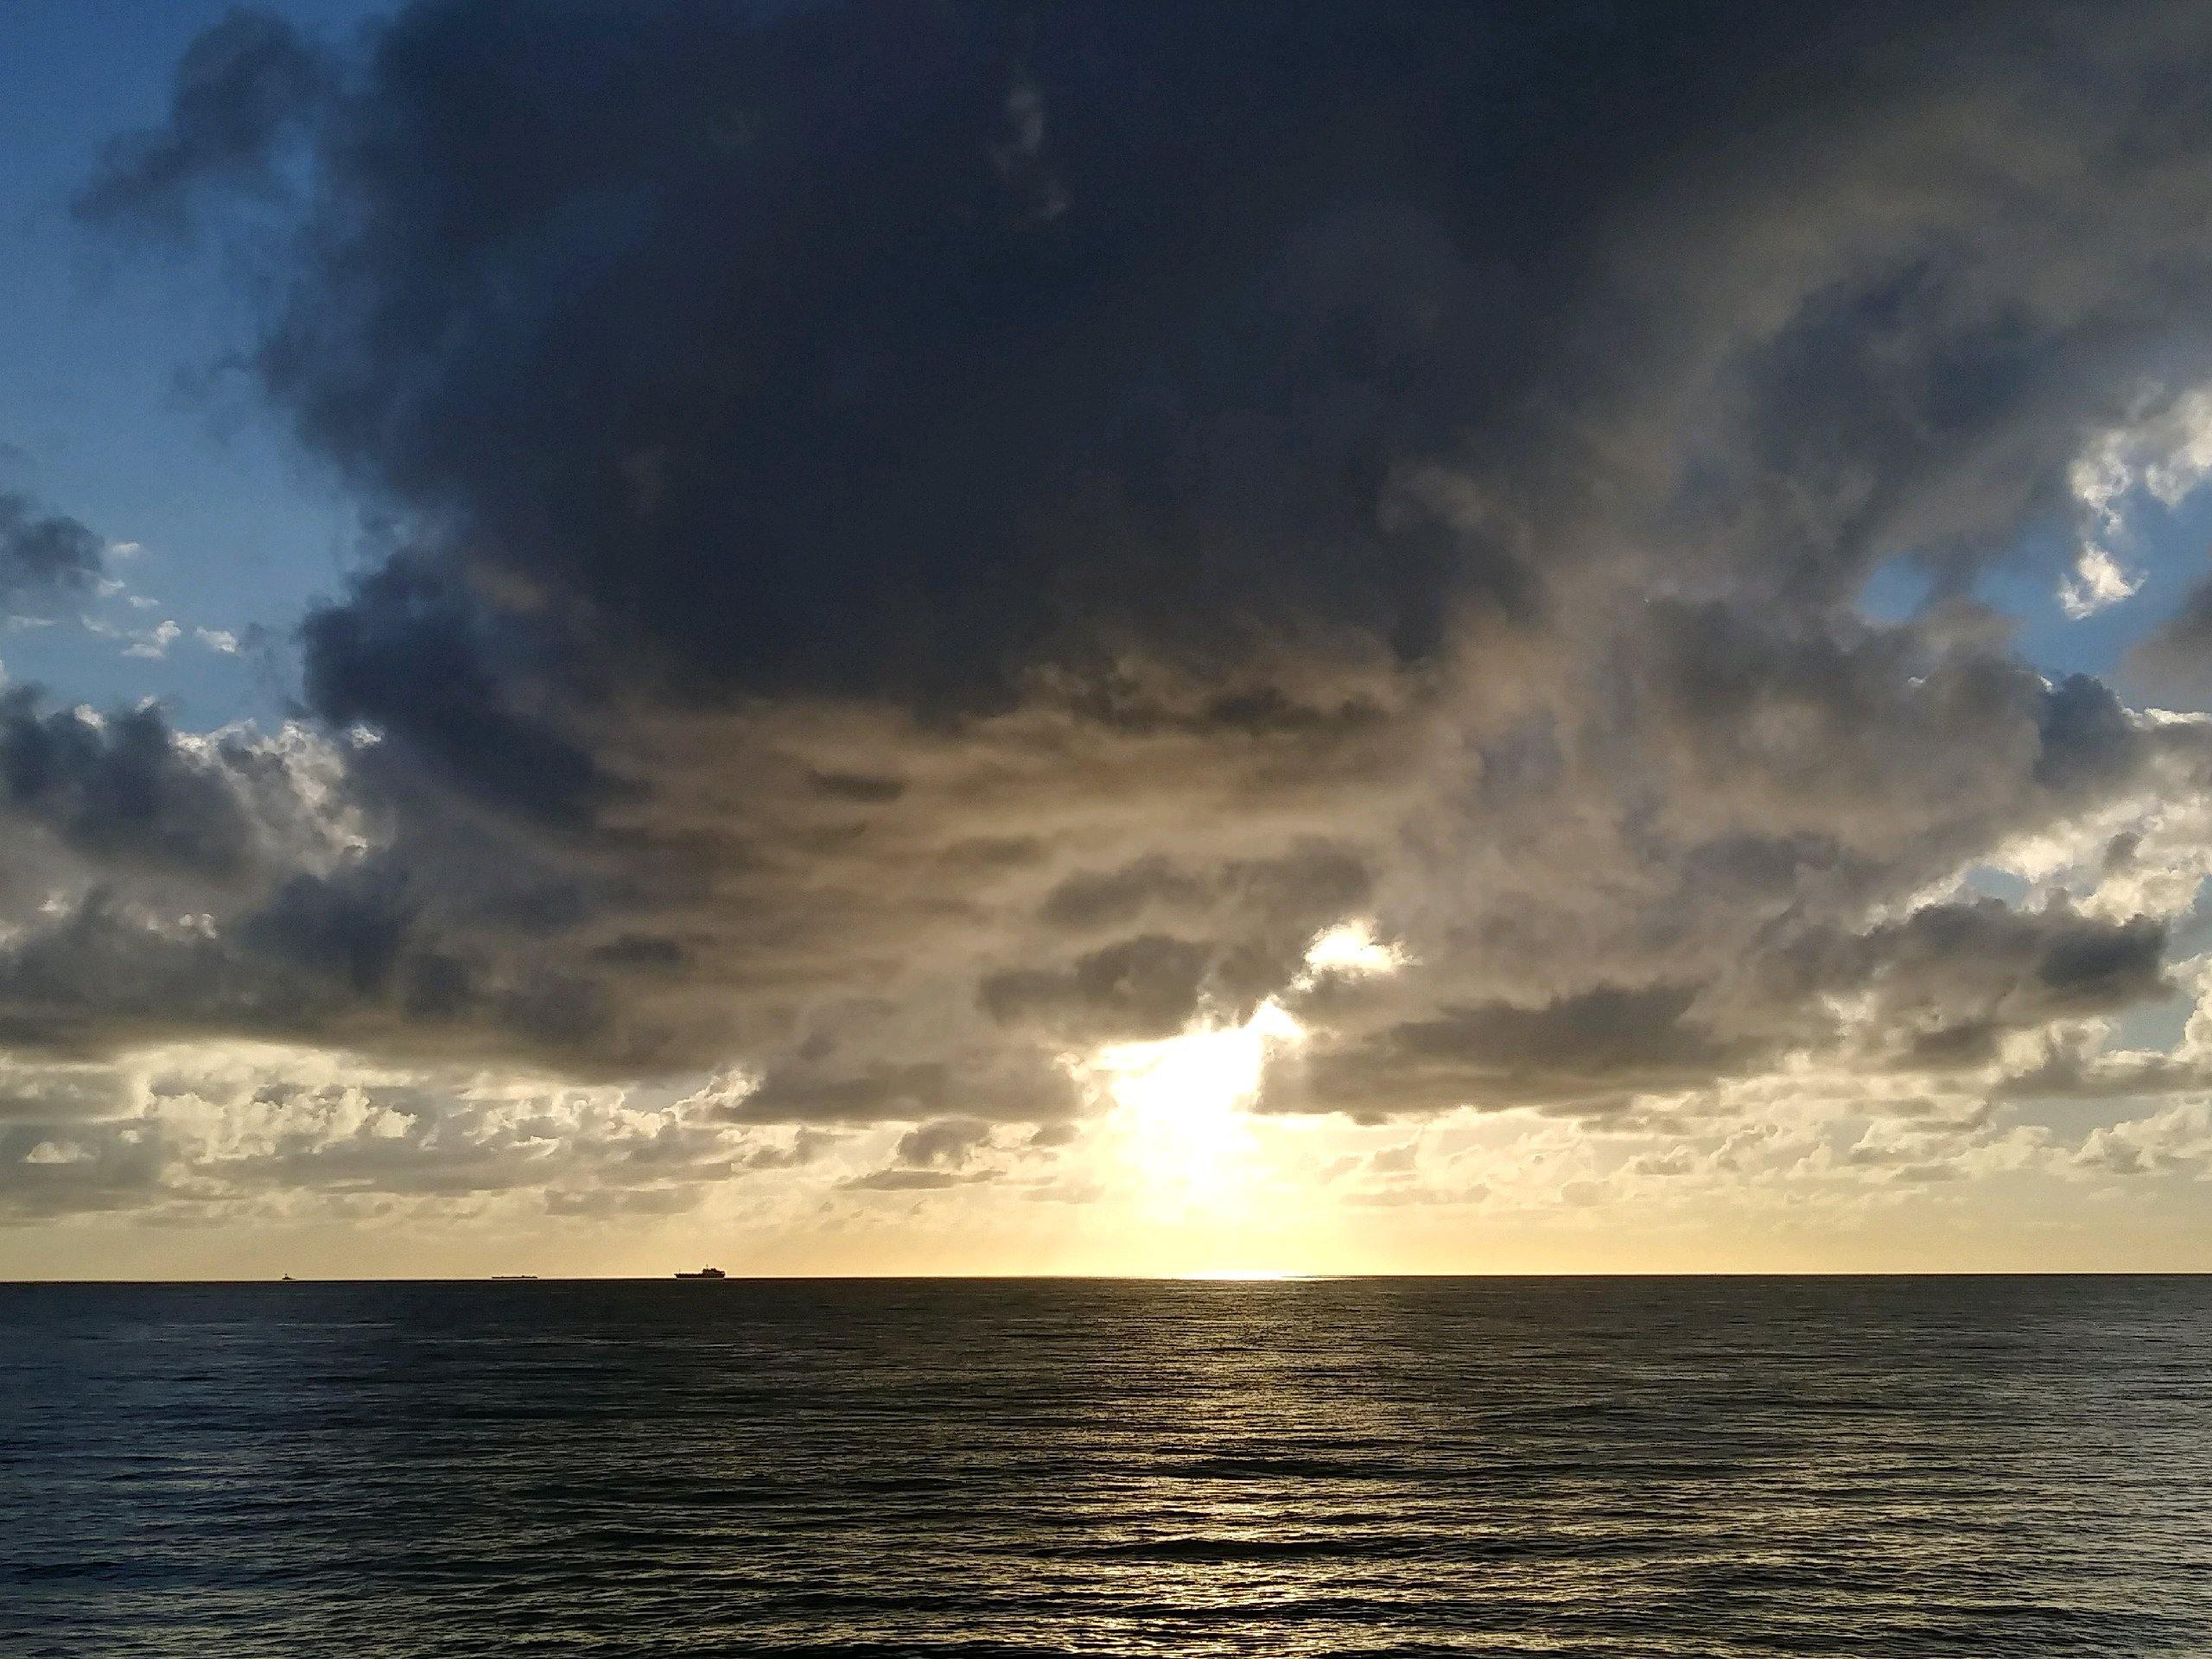 Dark storm cloud over an ocean sunrise